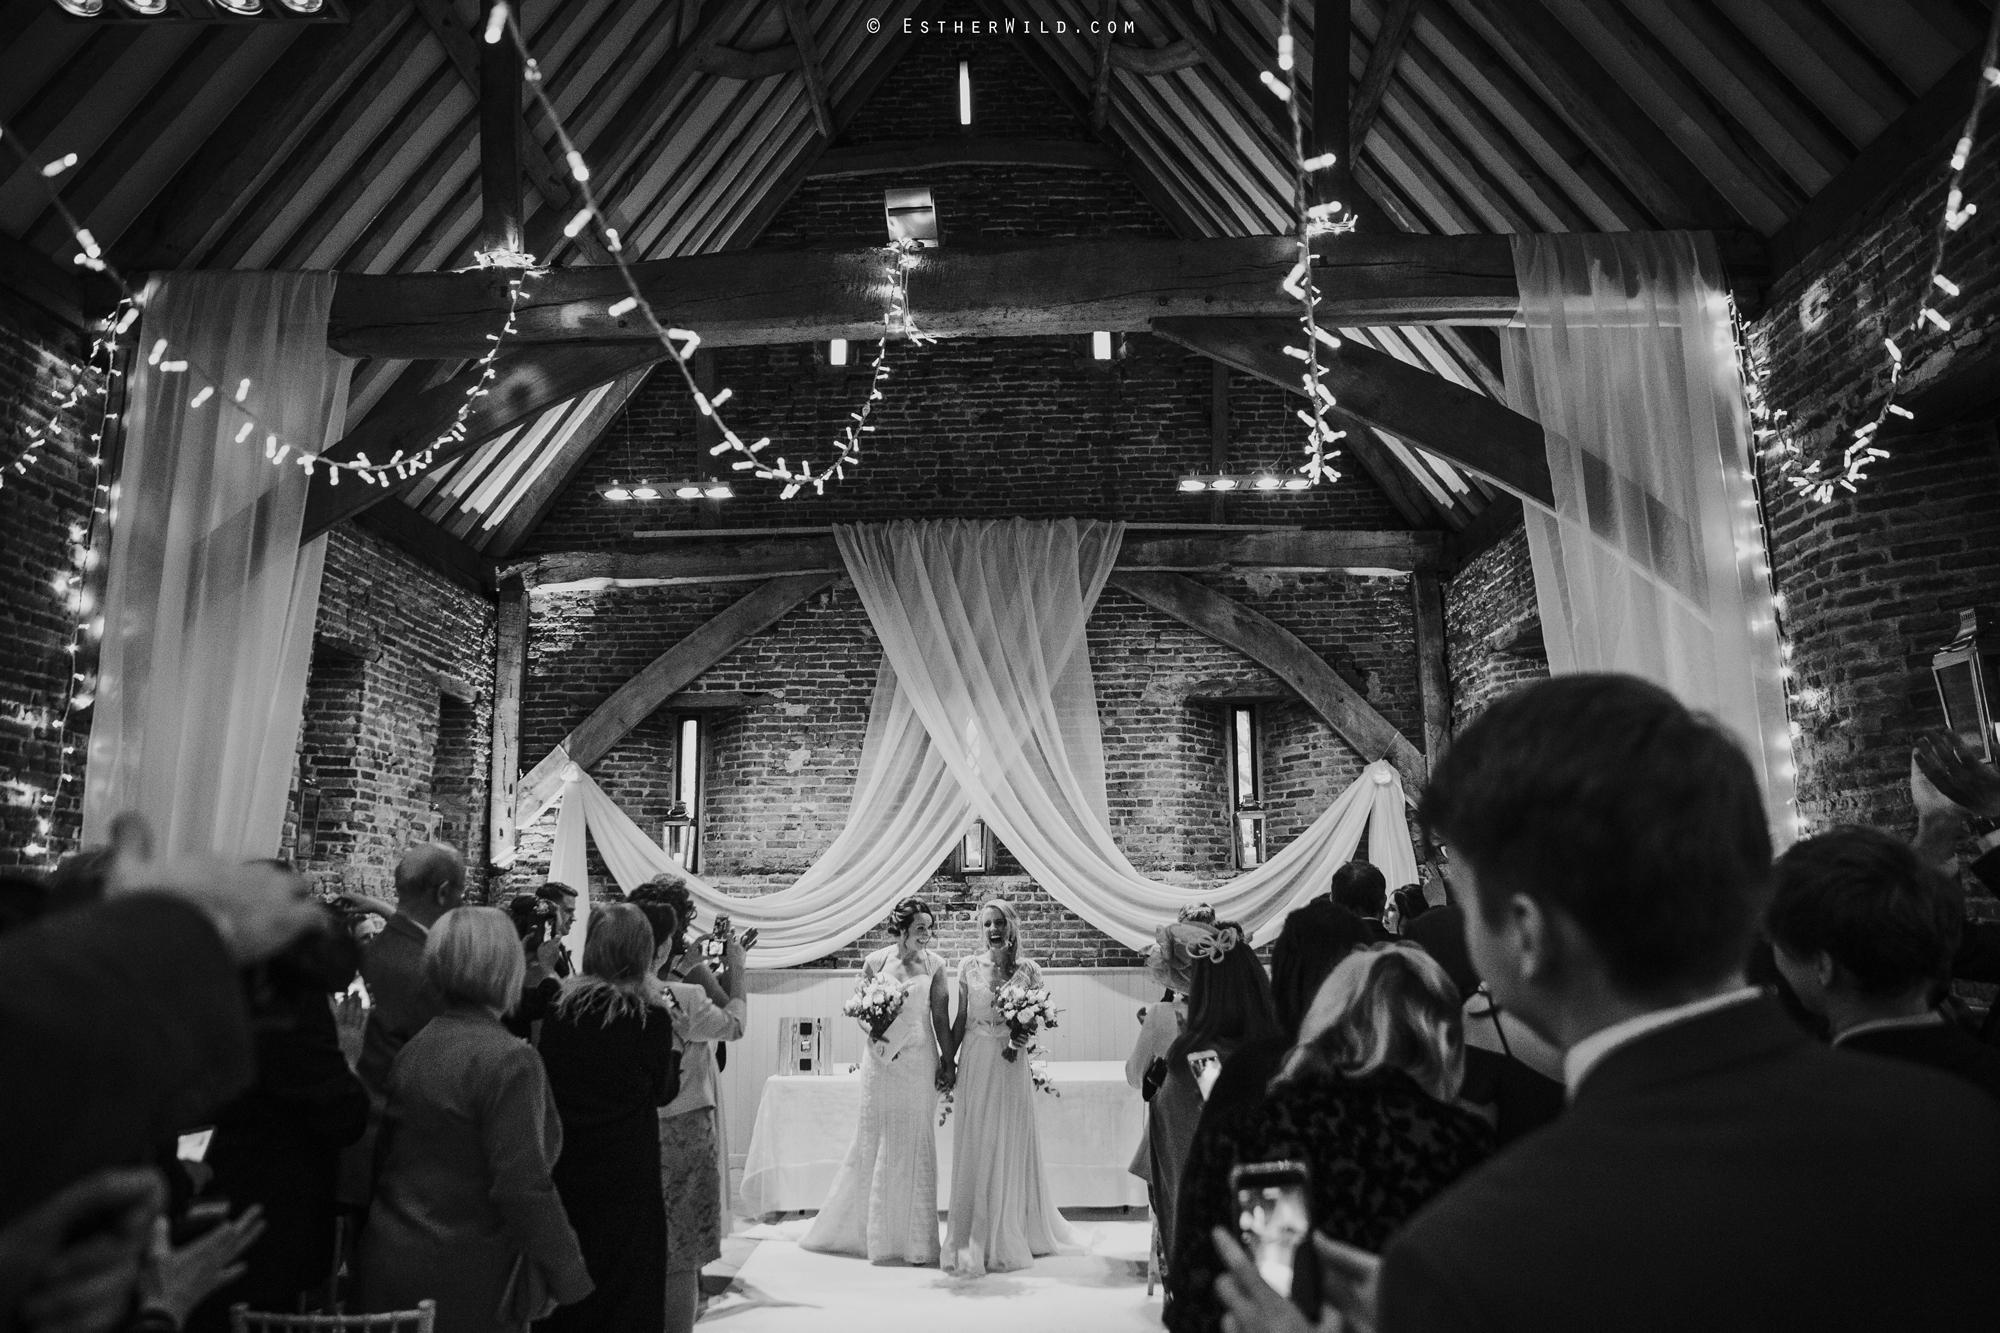 Elms_Barn_Weddings_Suffolk_Photographer_Copyright_Esther_Wild_IMG_1393-2.jpg